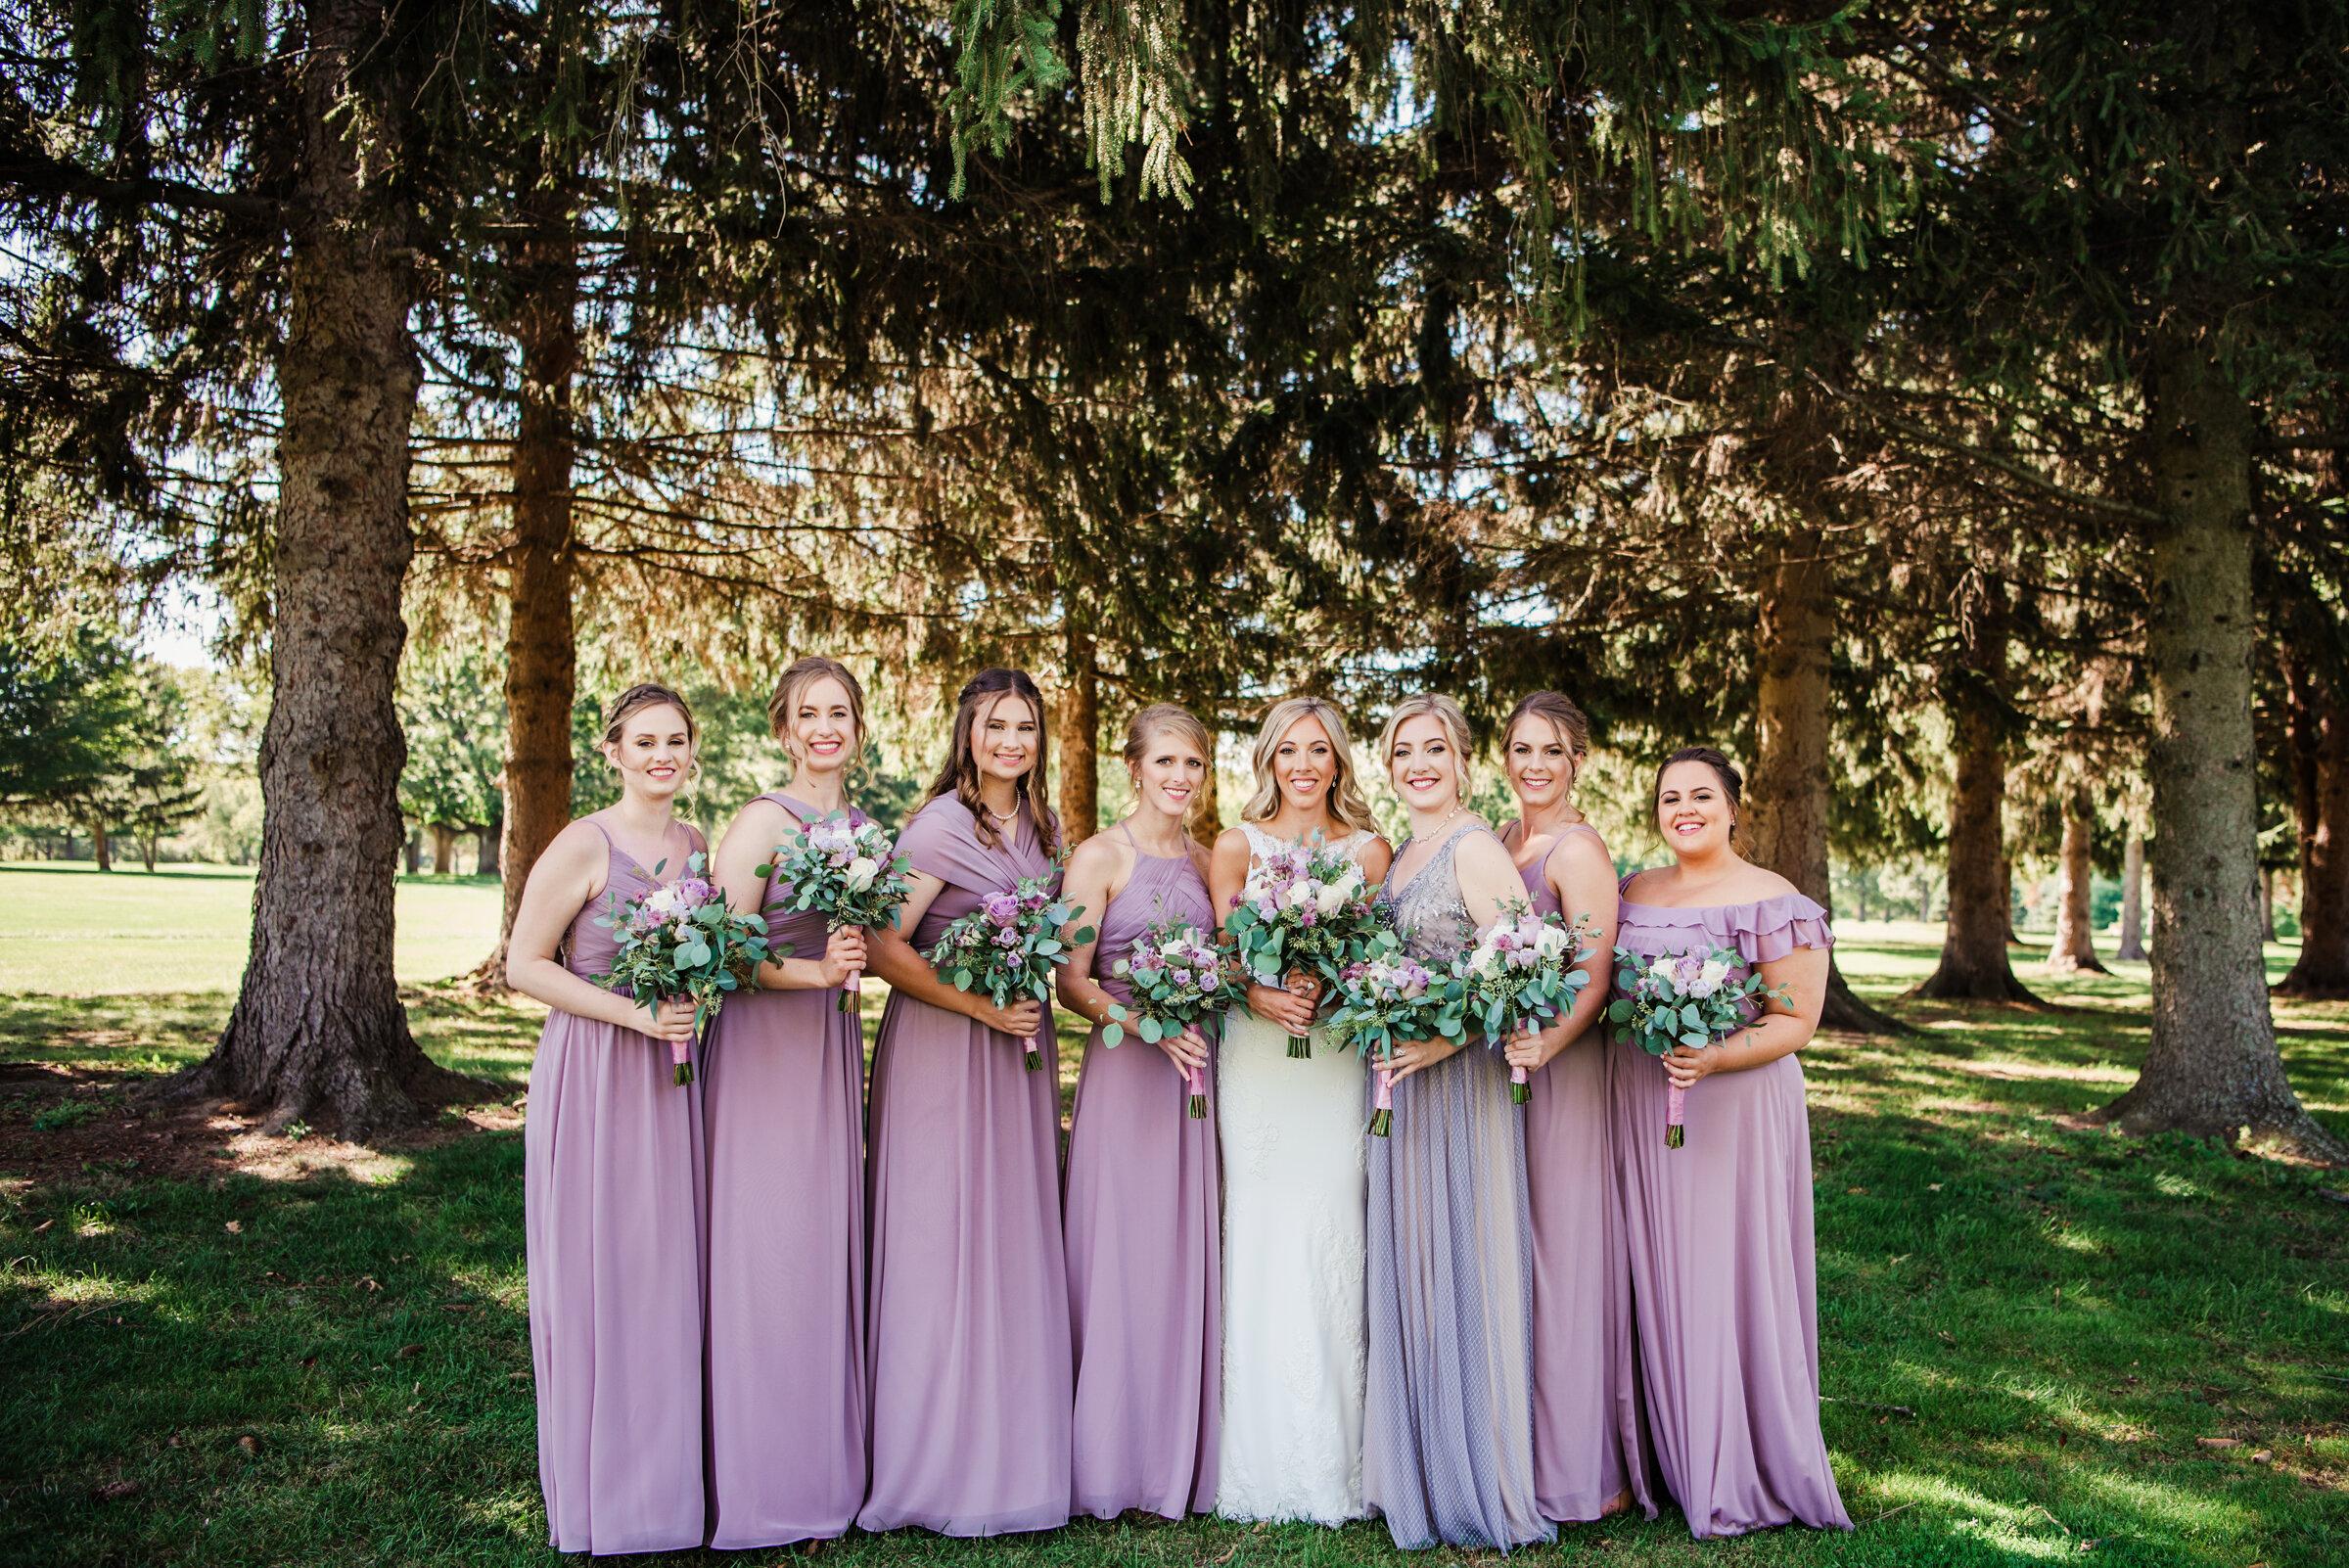 Deerfield_Country_Club_Rochester_Wedding_JILL_STUDIO_Rochester_NY_Photographer_DSC_6056.jpg